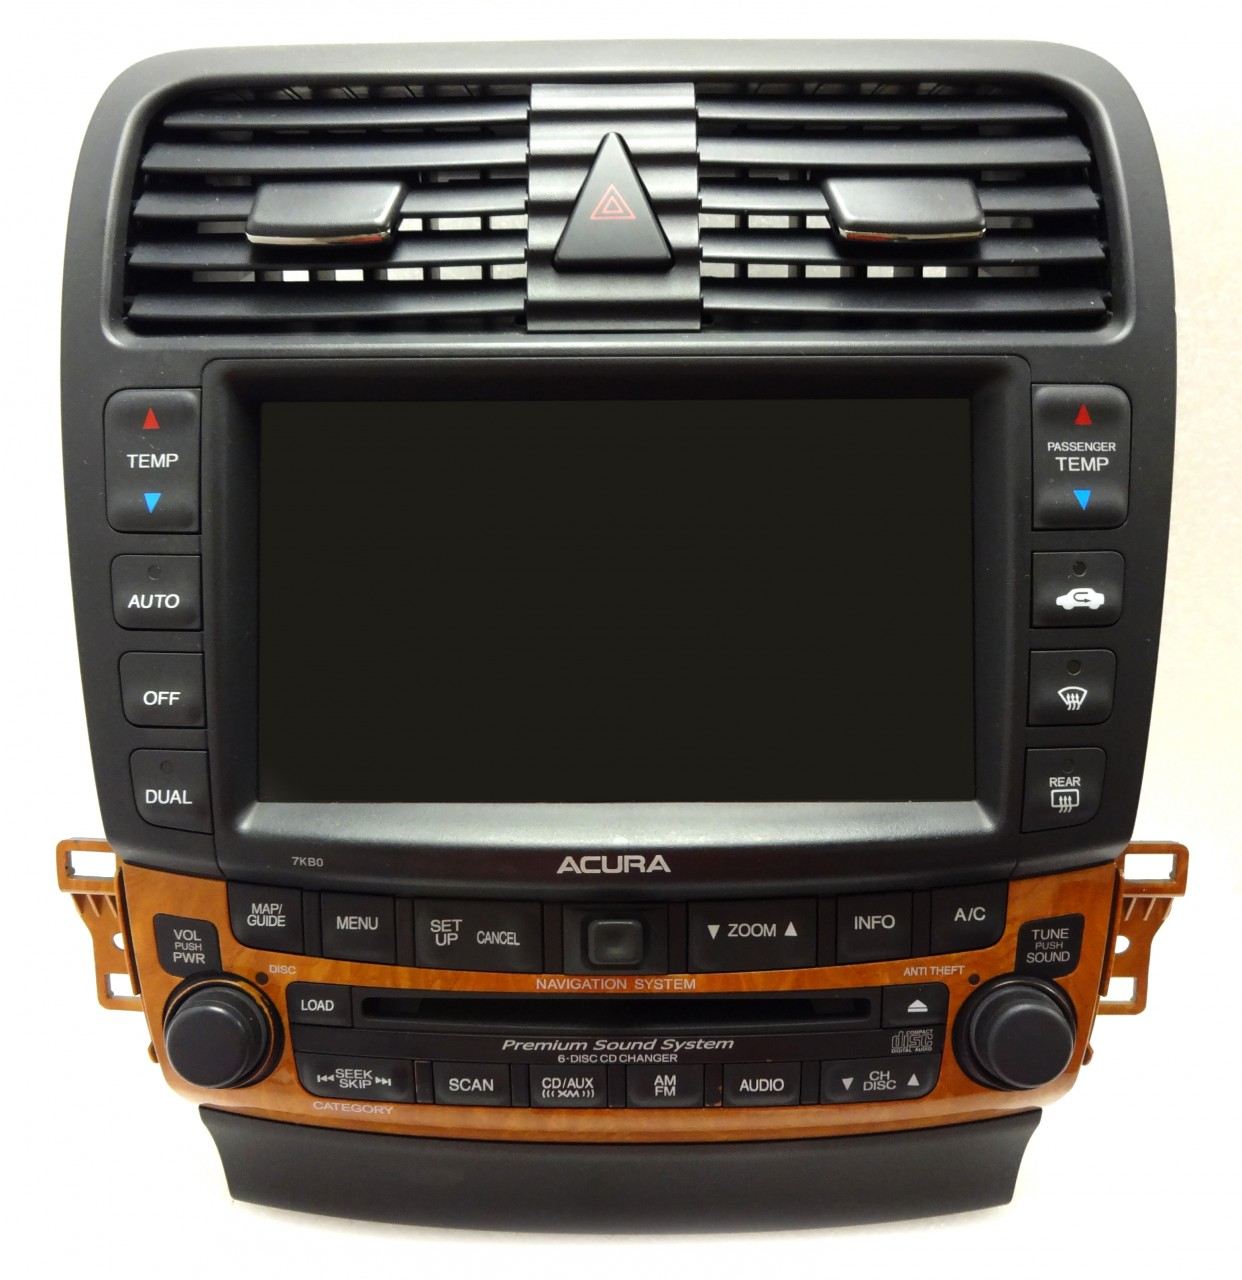 REPAIR 04 05 06 07 08 Acura TSX Navigation CD Disc Changer